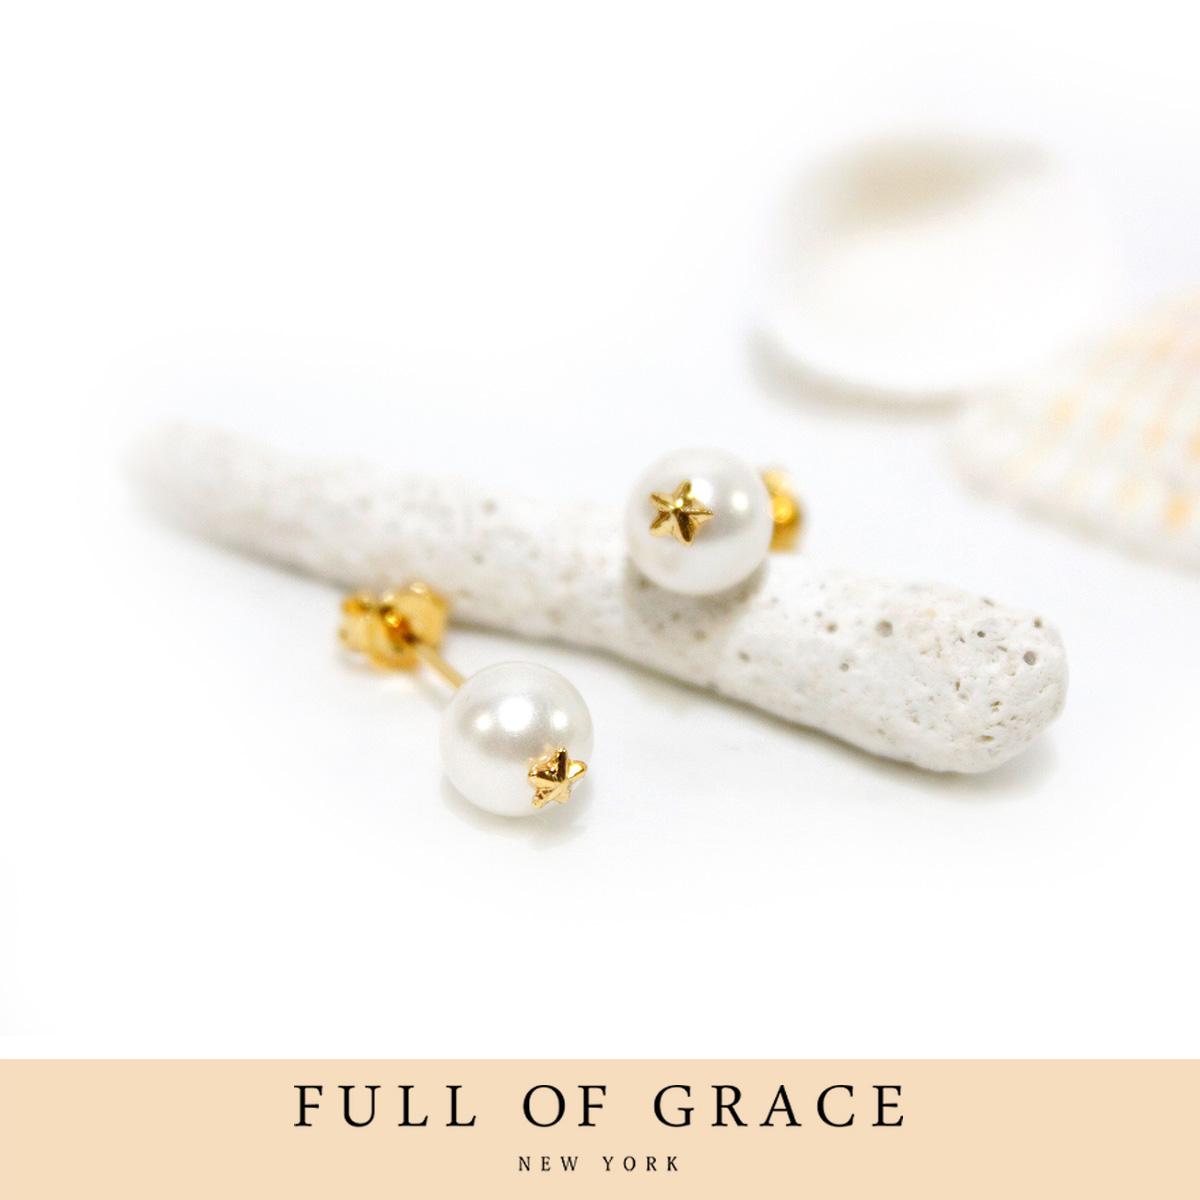 Full of Grace NY Jewelry フルオブグレイスニューヨークジュエリー PEARL STAR PIERCE EARRINGS